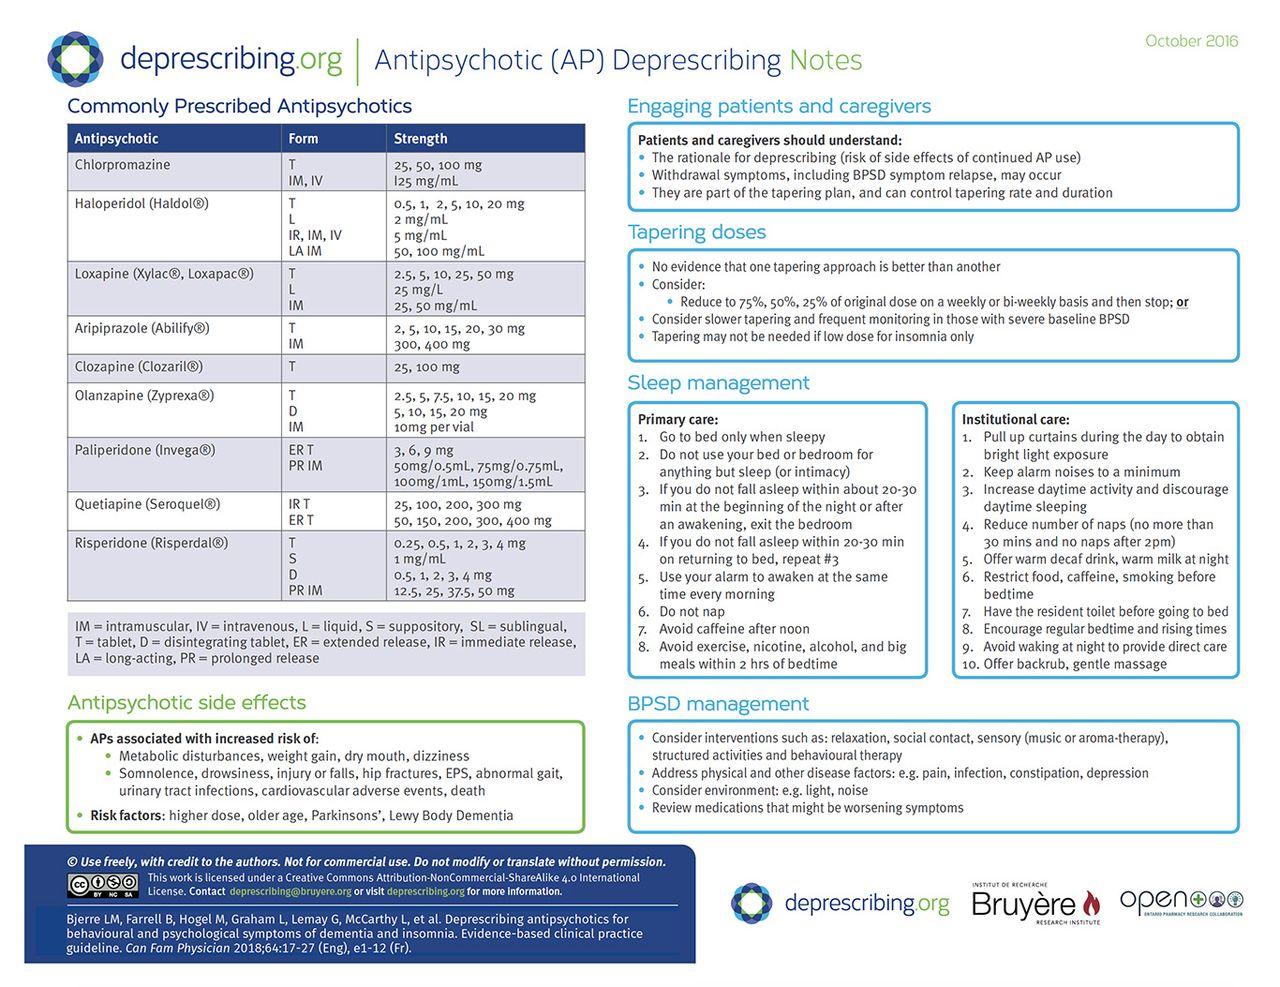 Most sedating anti psychotics and dementia